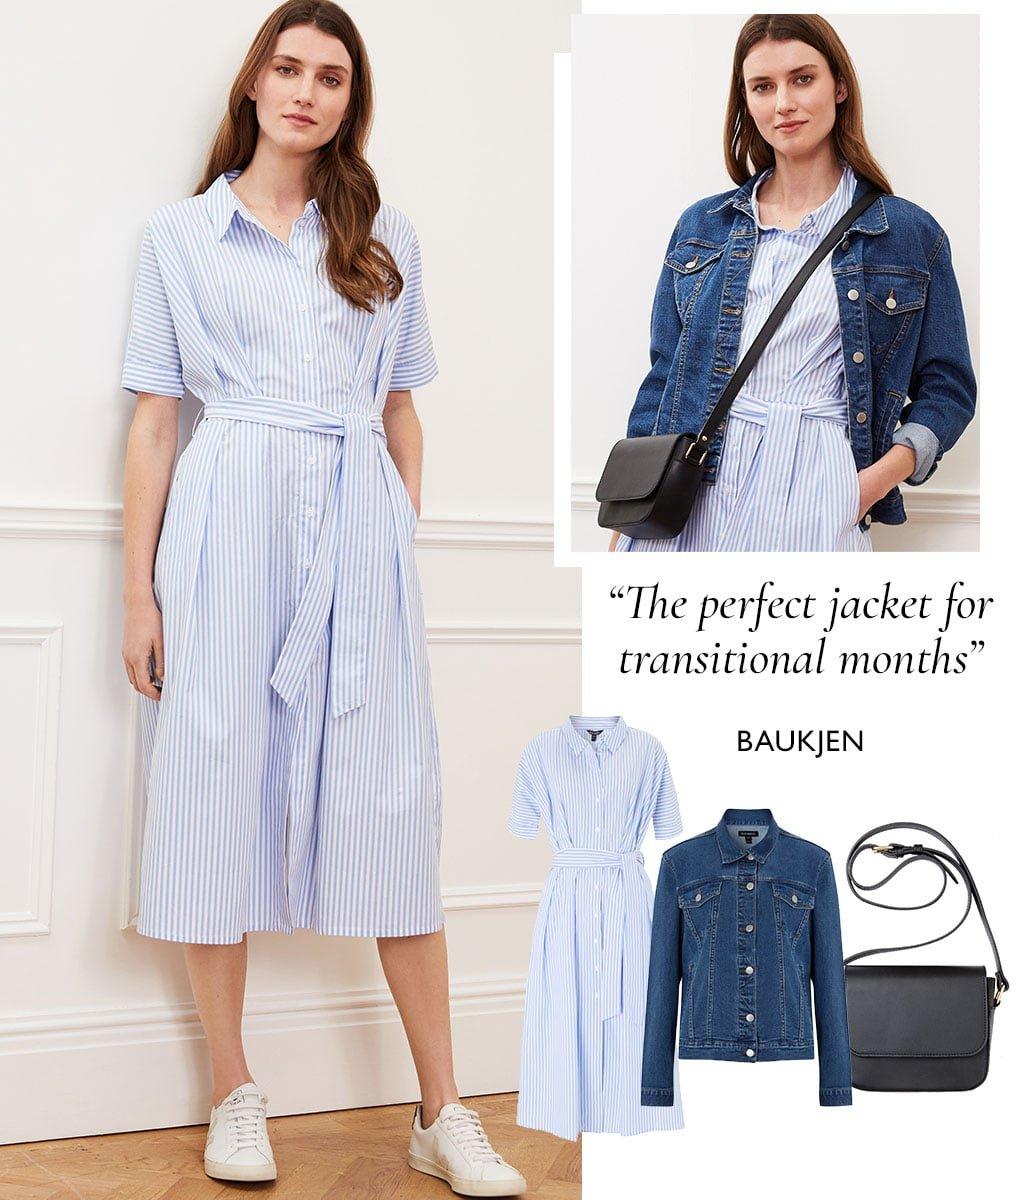 Shop Organic Denim Jacket Washed Indigo, Betty Leather Cross-body Bag Caviar Black, Arbor Shirt Dress Sky Blue & White and more